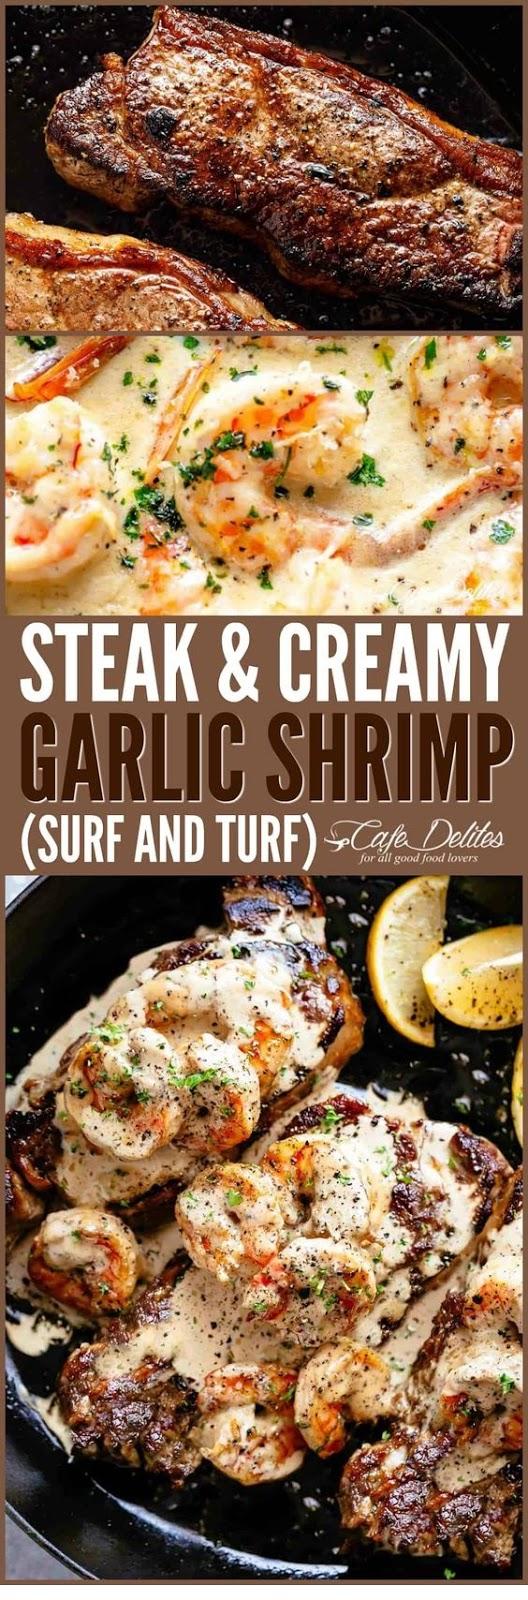 Steak And Creamy Garlic Shrimp